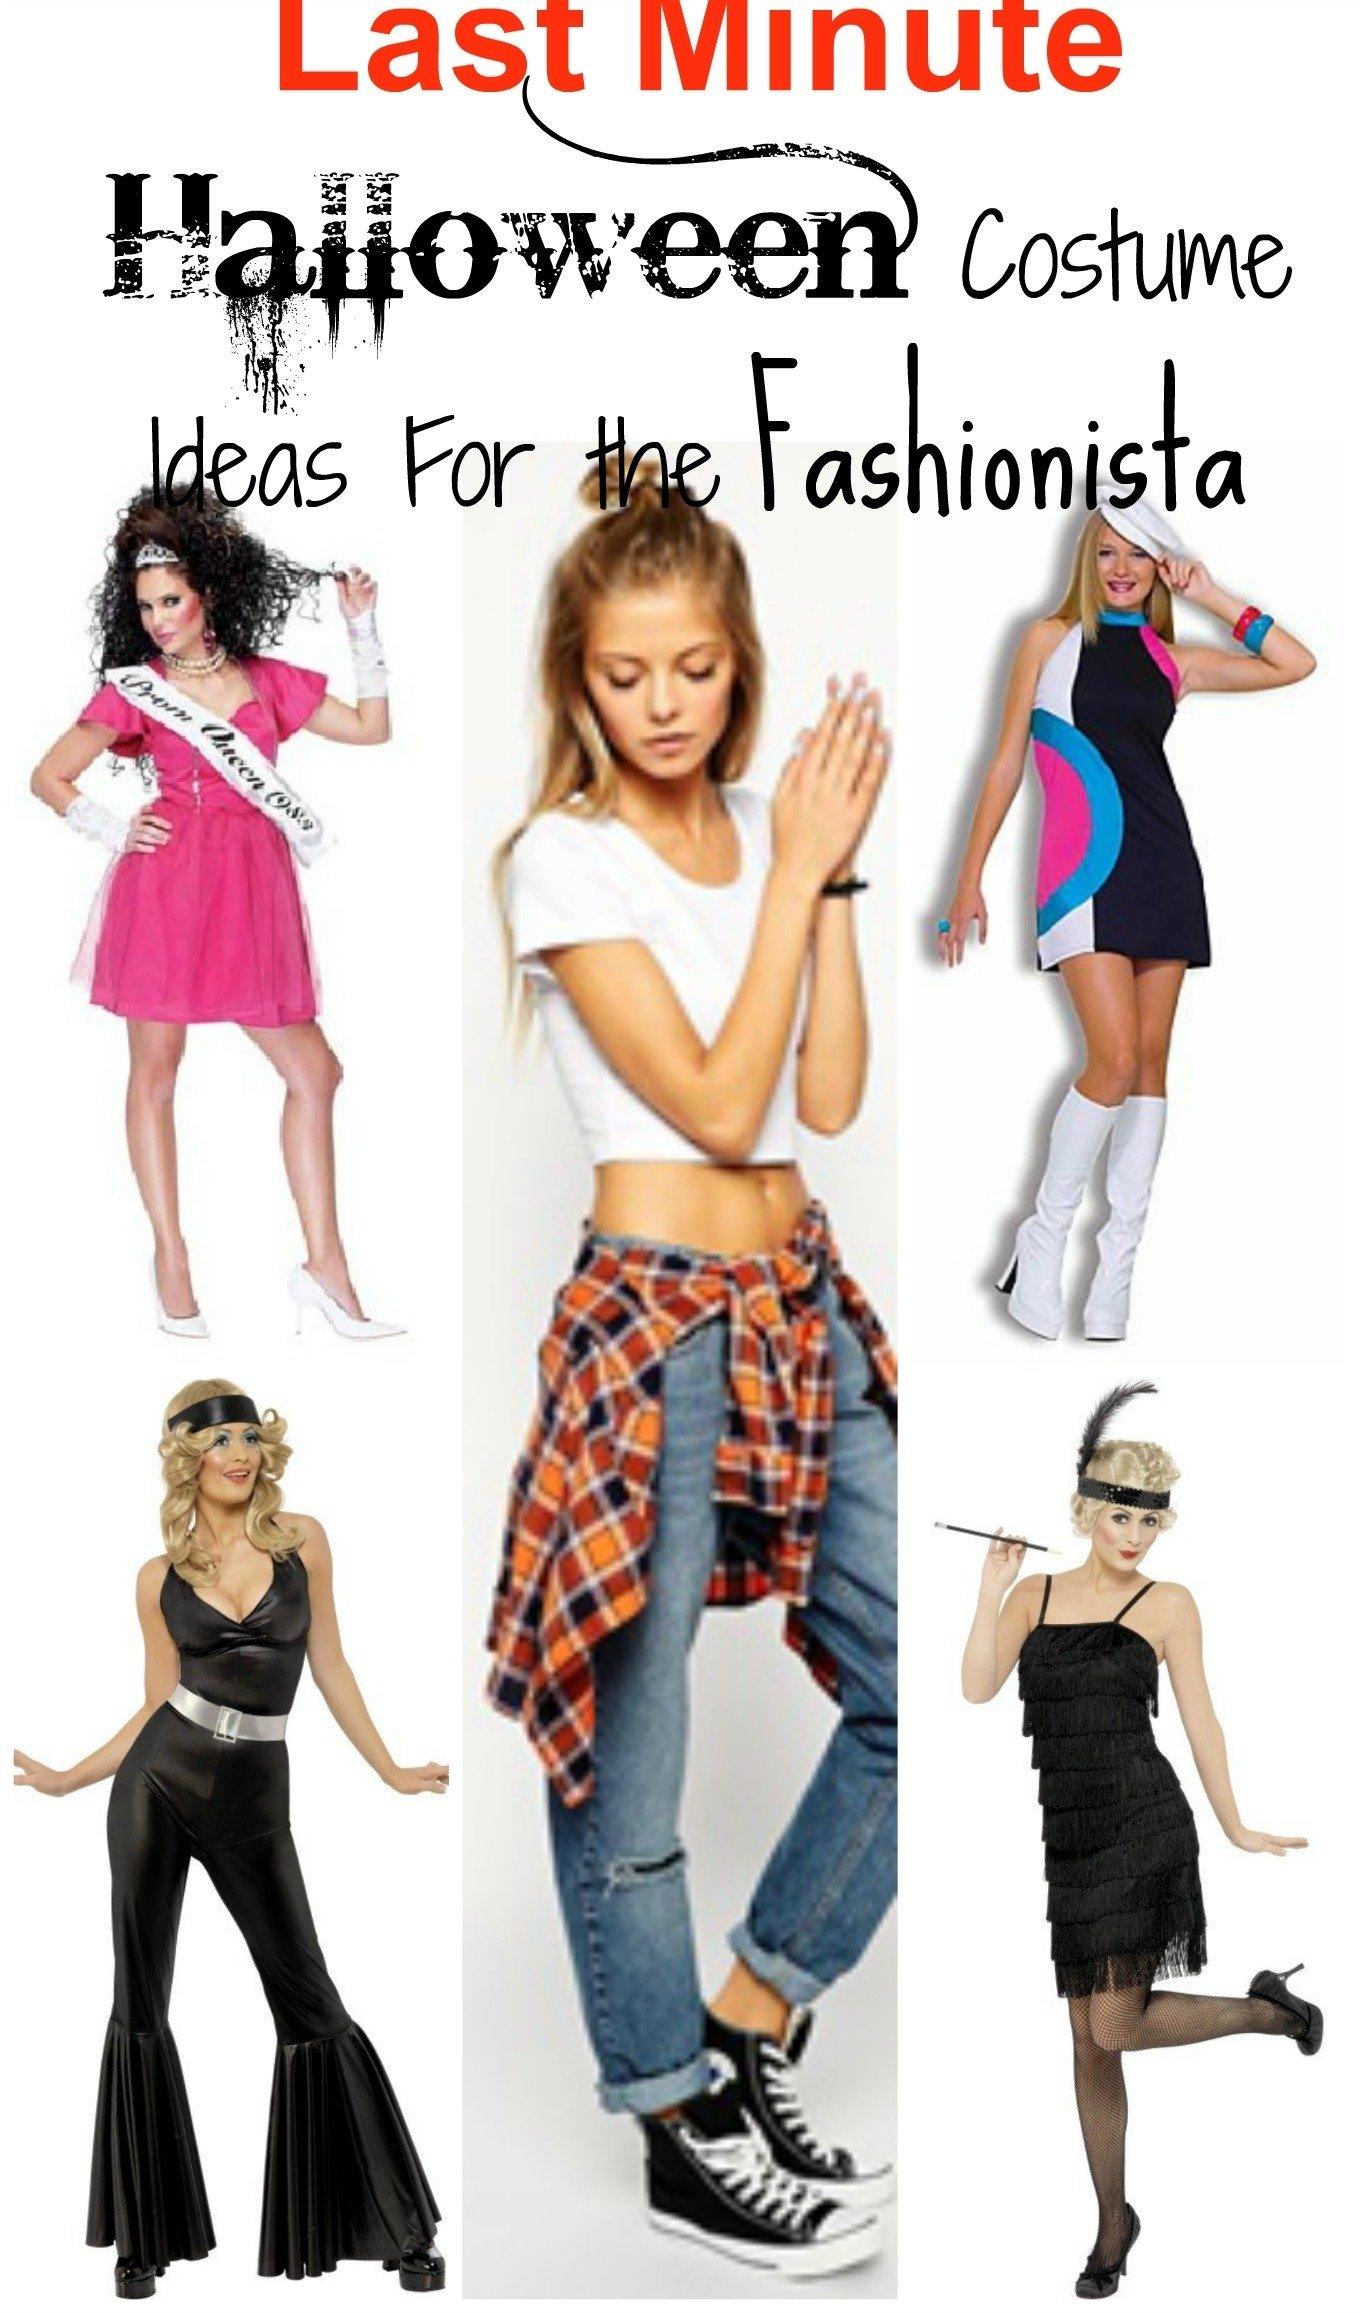 halloween costume 5 minutes - prêt à porter féminin et masculin